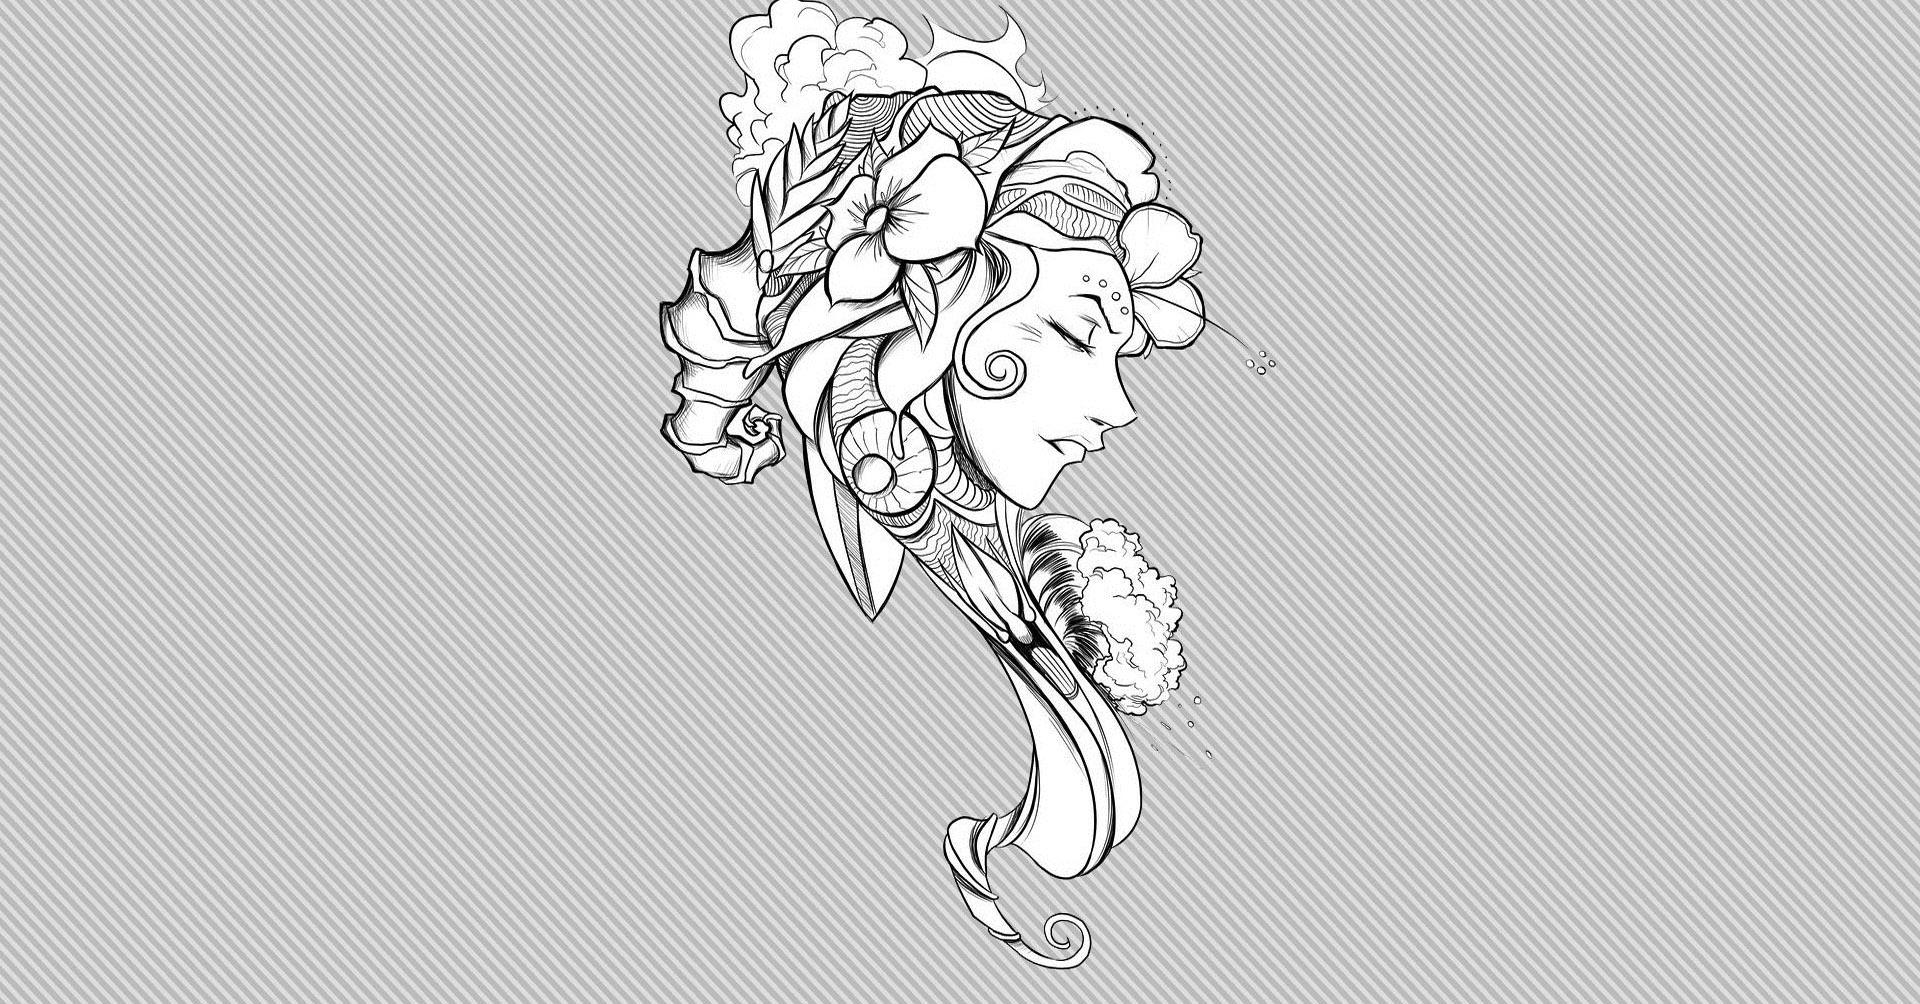 Wallpaper Drawing Artwork Line Art Graphic Design